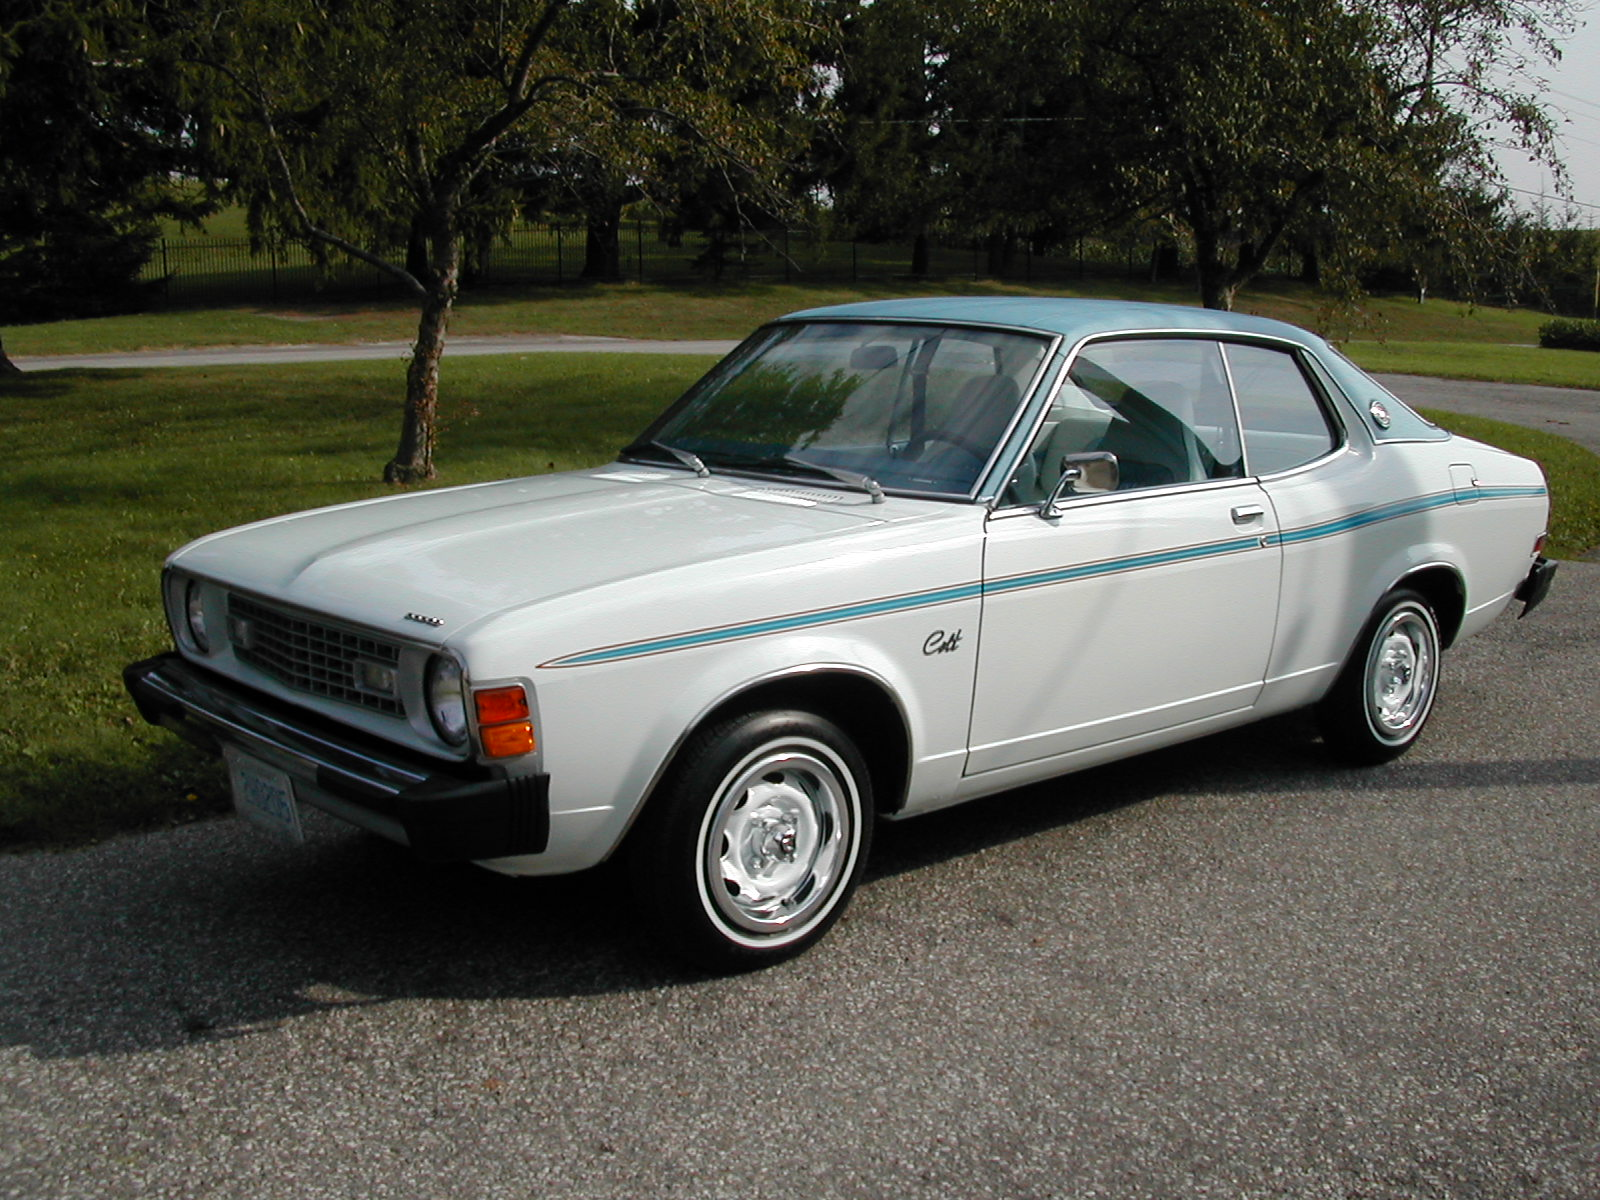 1976 Dodge Challenger Pic